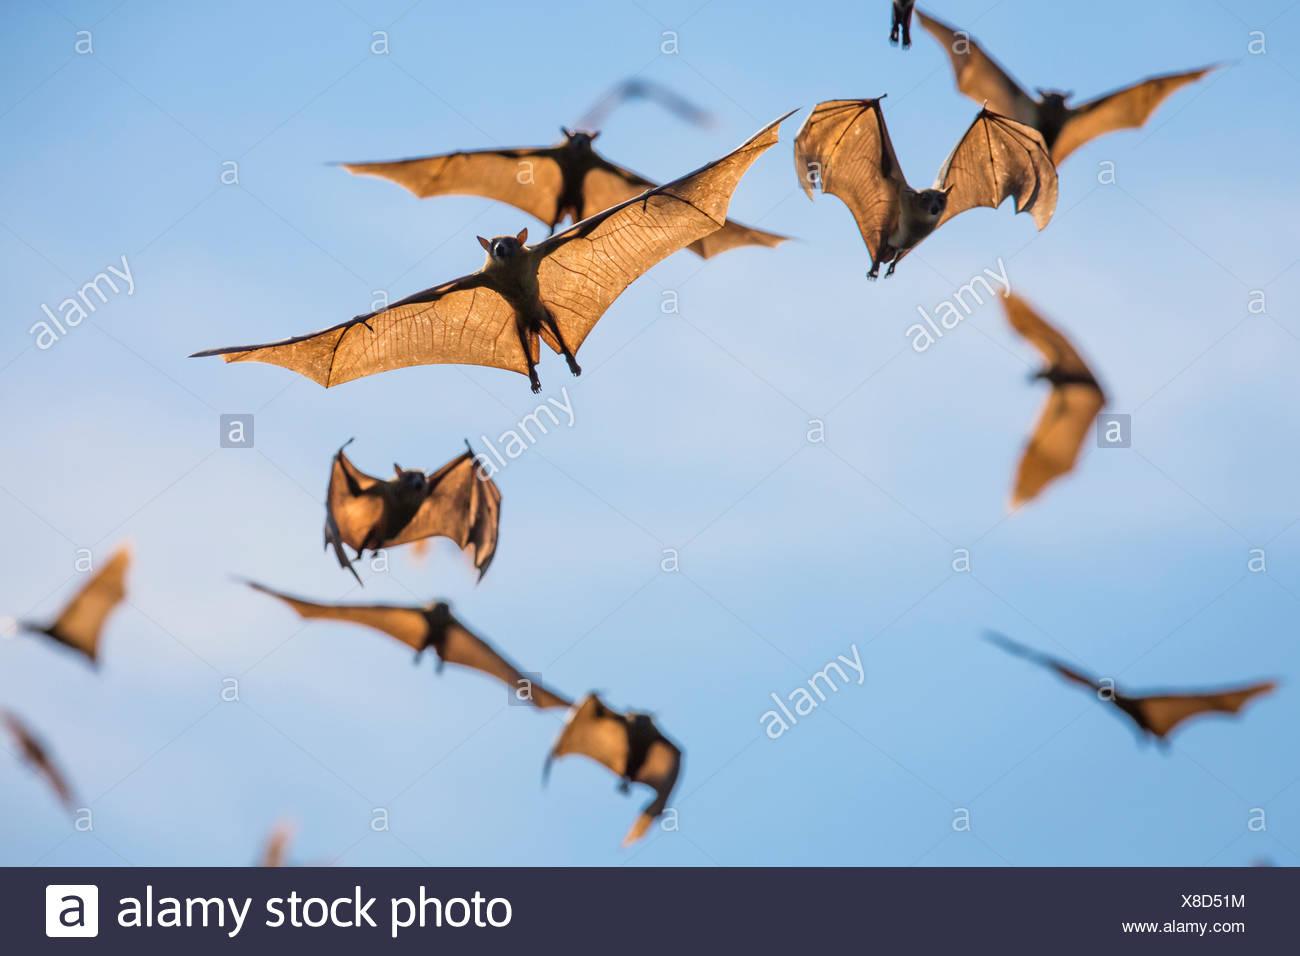 Mass of Straw-coloured fruit bat (Eidolon helvum) in flight, Kasanka National Park, Zambia. - Stock Image